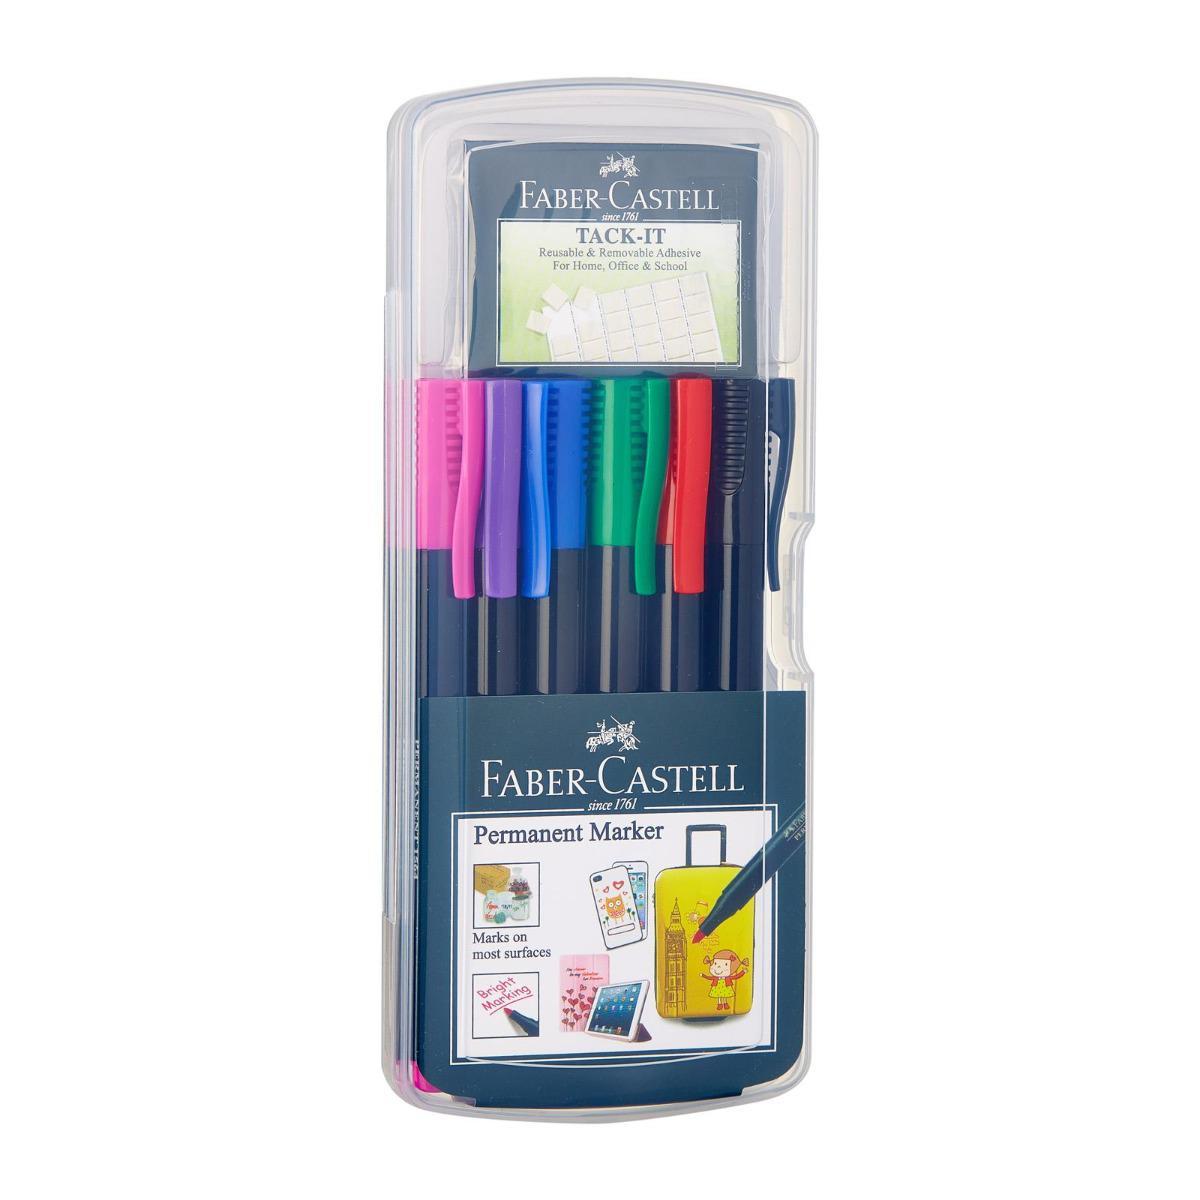 Faber-Castell Permanent Marker 1564 Slim MK156477